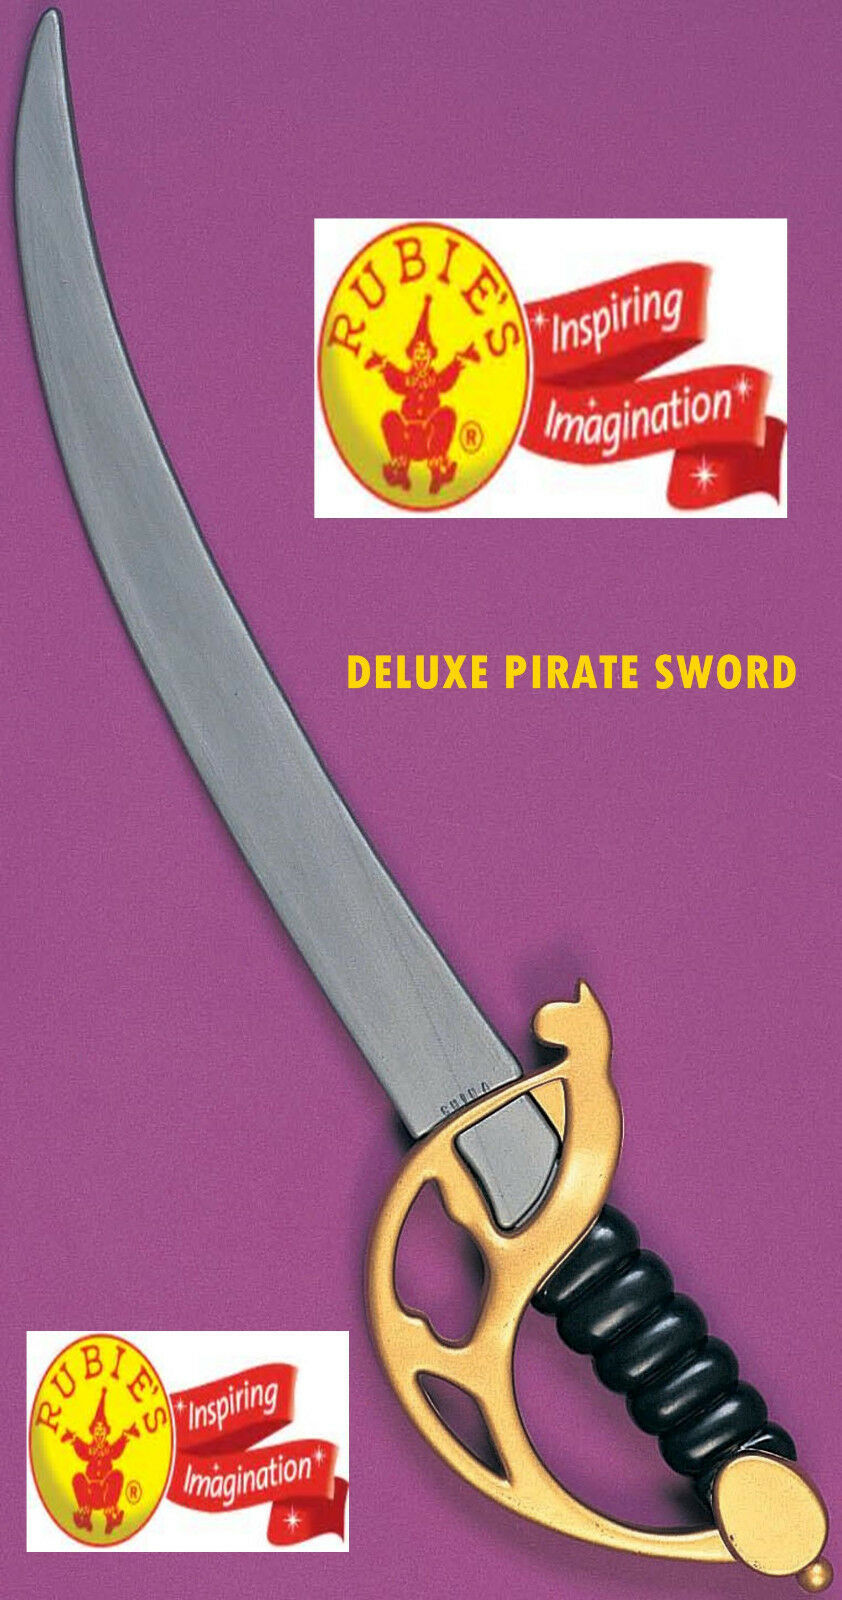 Cutlass Pirate Sword Buccaneer Cosplay 4 Kids Adults Plastic by Rubies - $10.39